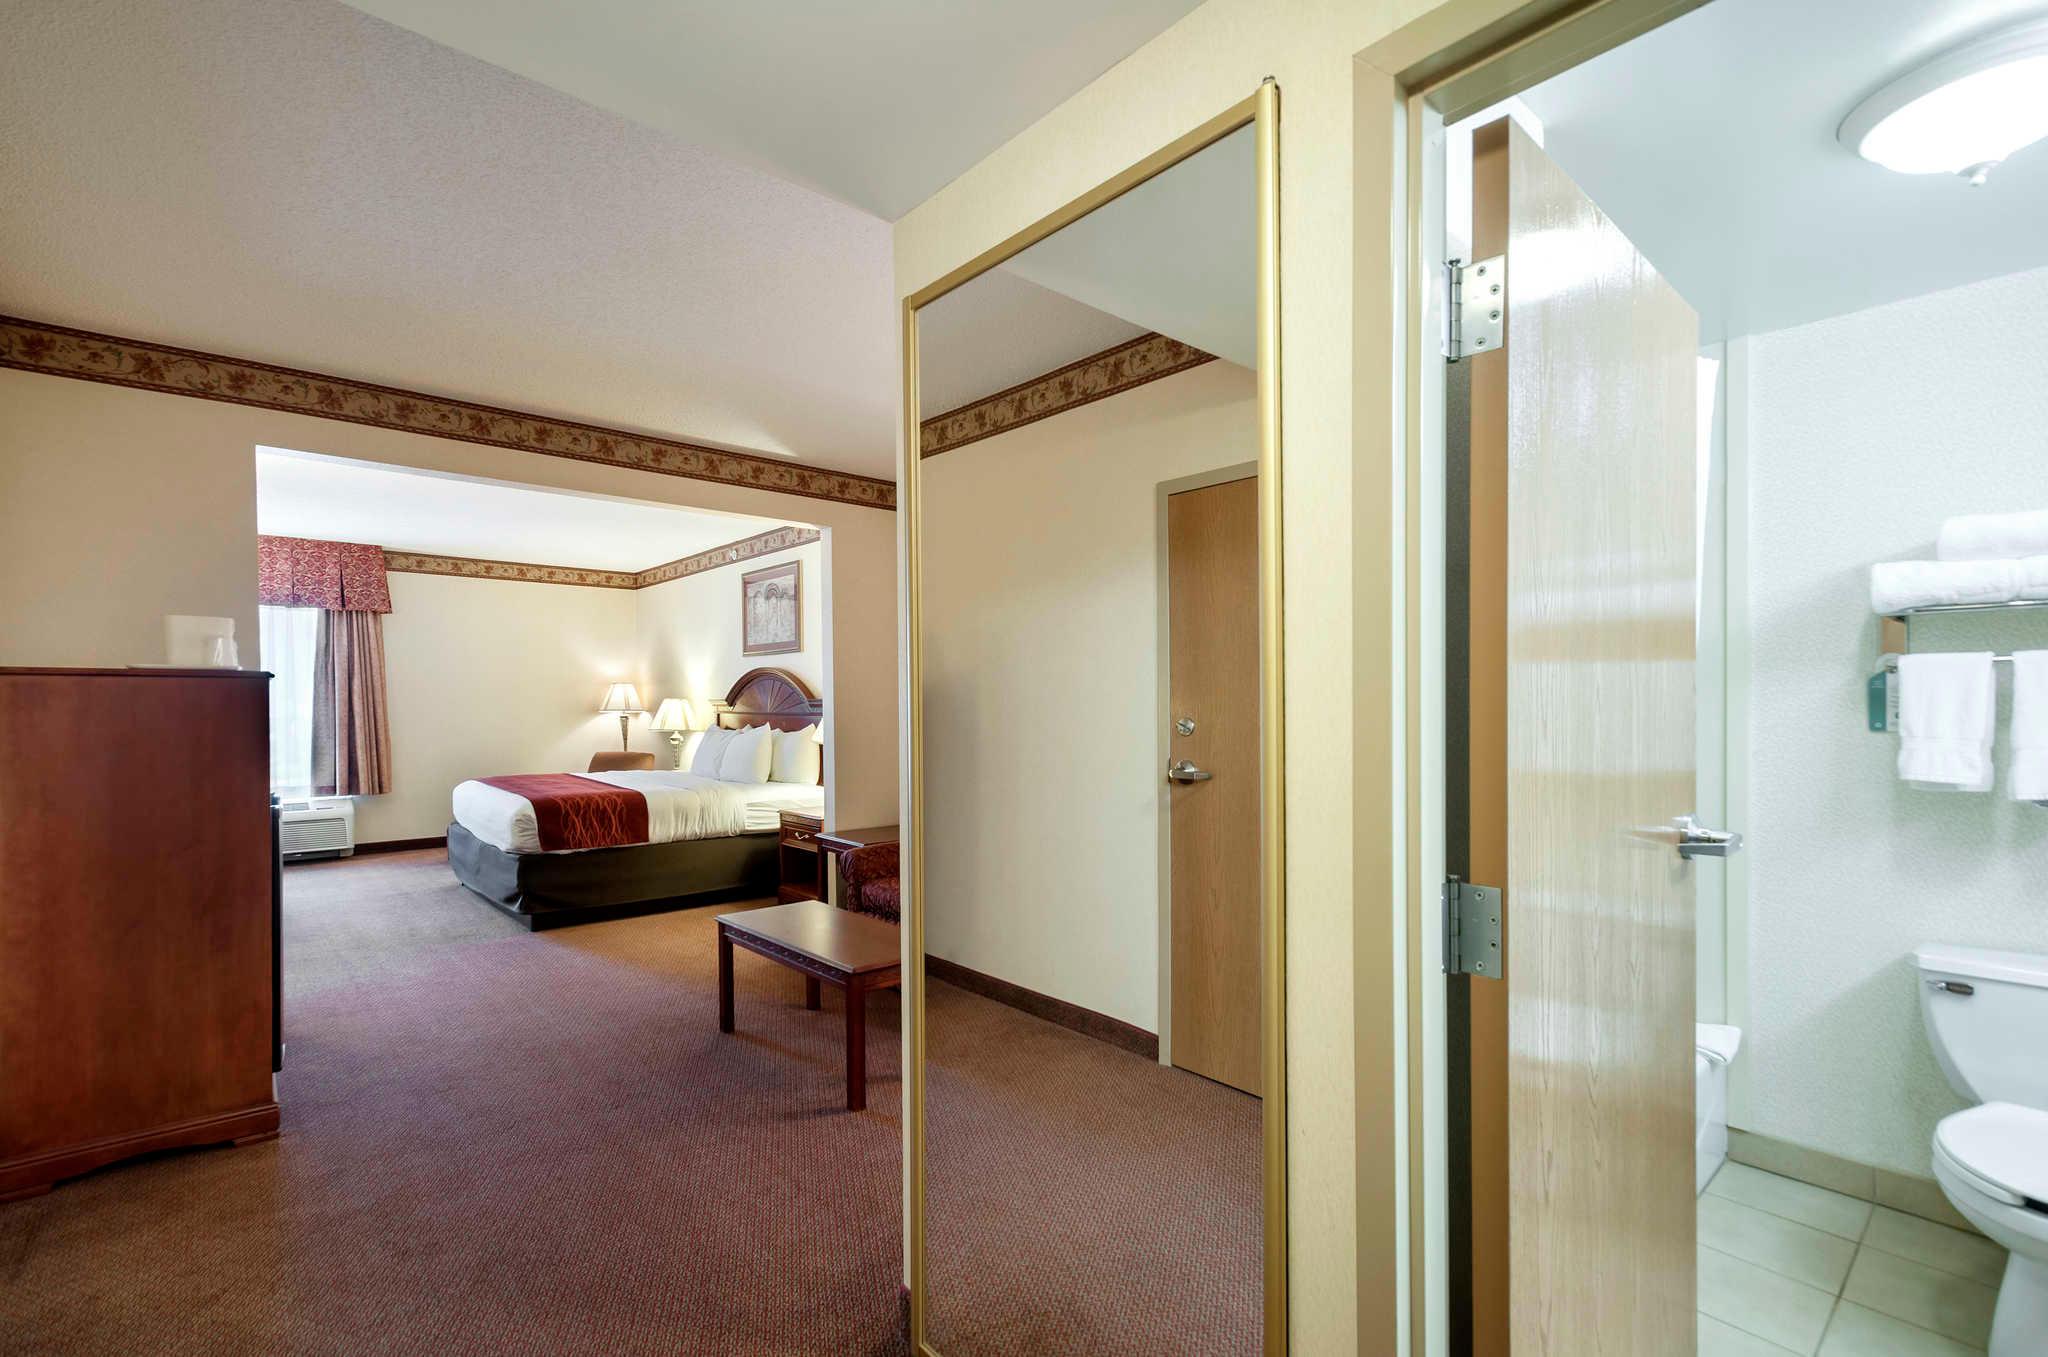 Comfort Inn & Suites Edgewood - Aberdeen image 16